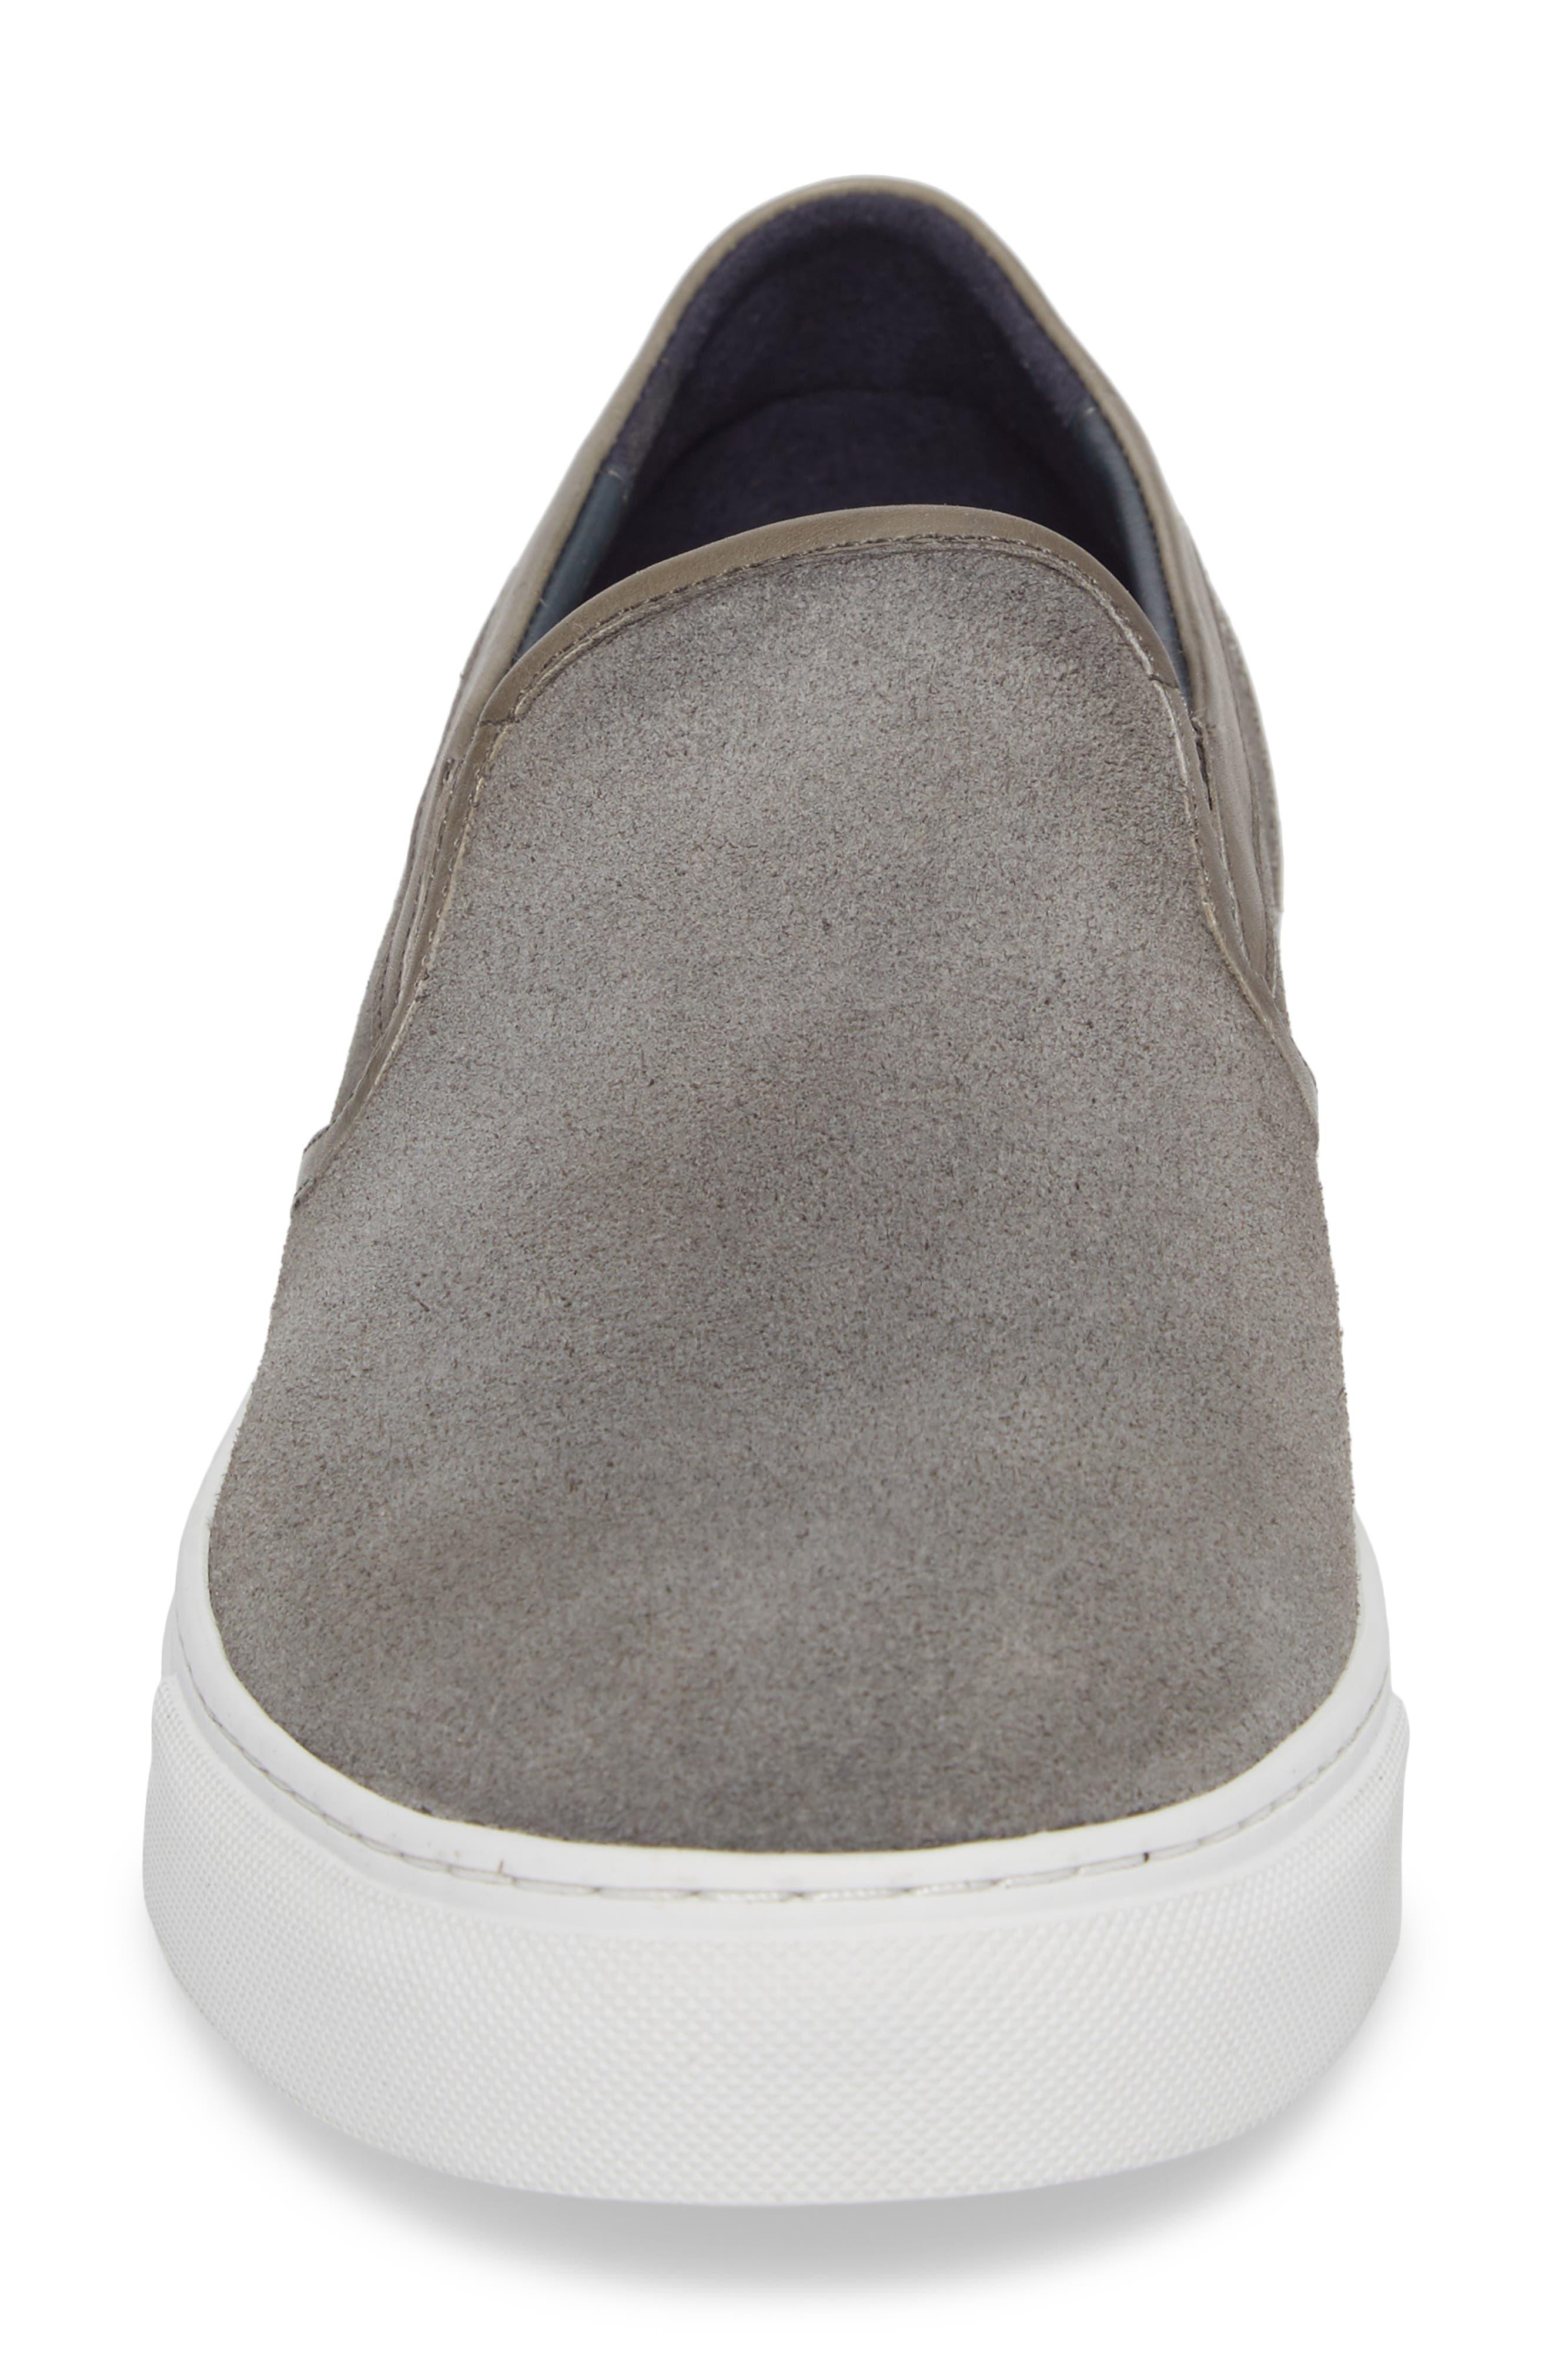 Vane Slip-On Sneaker,                             Alternate thumbnail 4, color,                             Grey Suede/ Leather